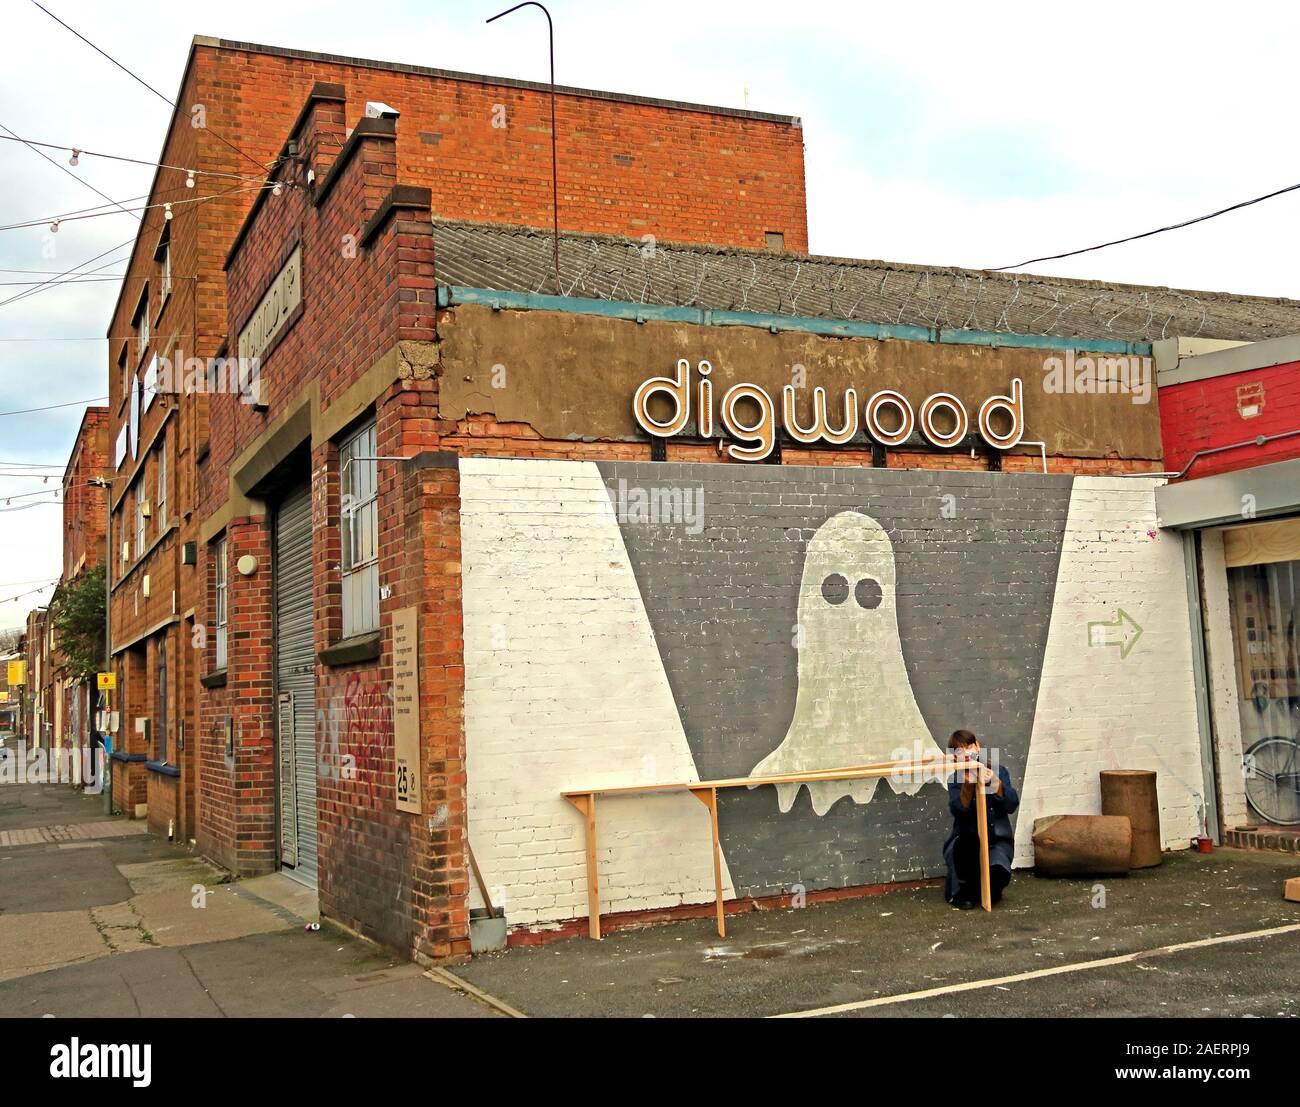 Dieses Stockfoto: Digwood, Ghost, Graffiti Urban Street Art, in Floodgate St, Digbeth, Bordesley & Highgate, Birmingham, West Midlands, England, Großbritannien, B5 5ST - 2AERPJ